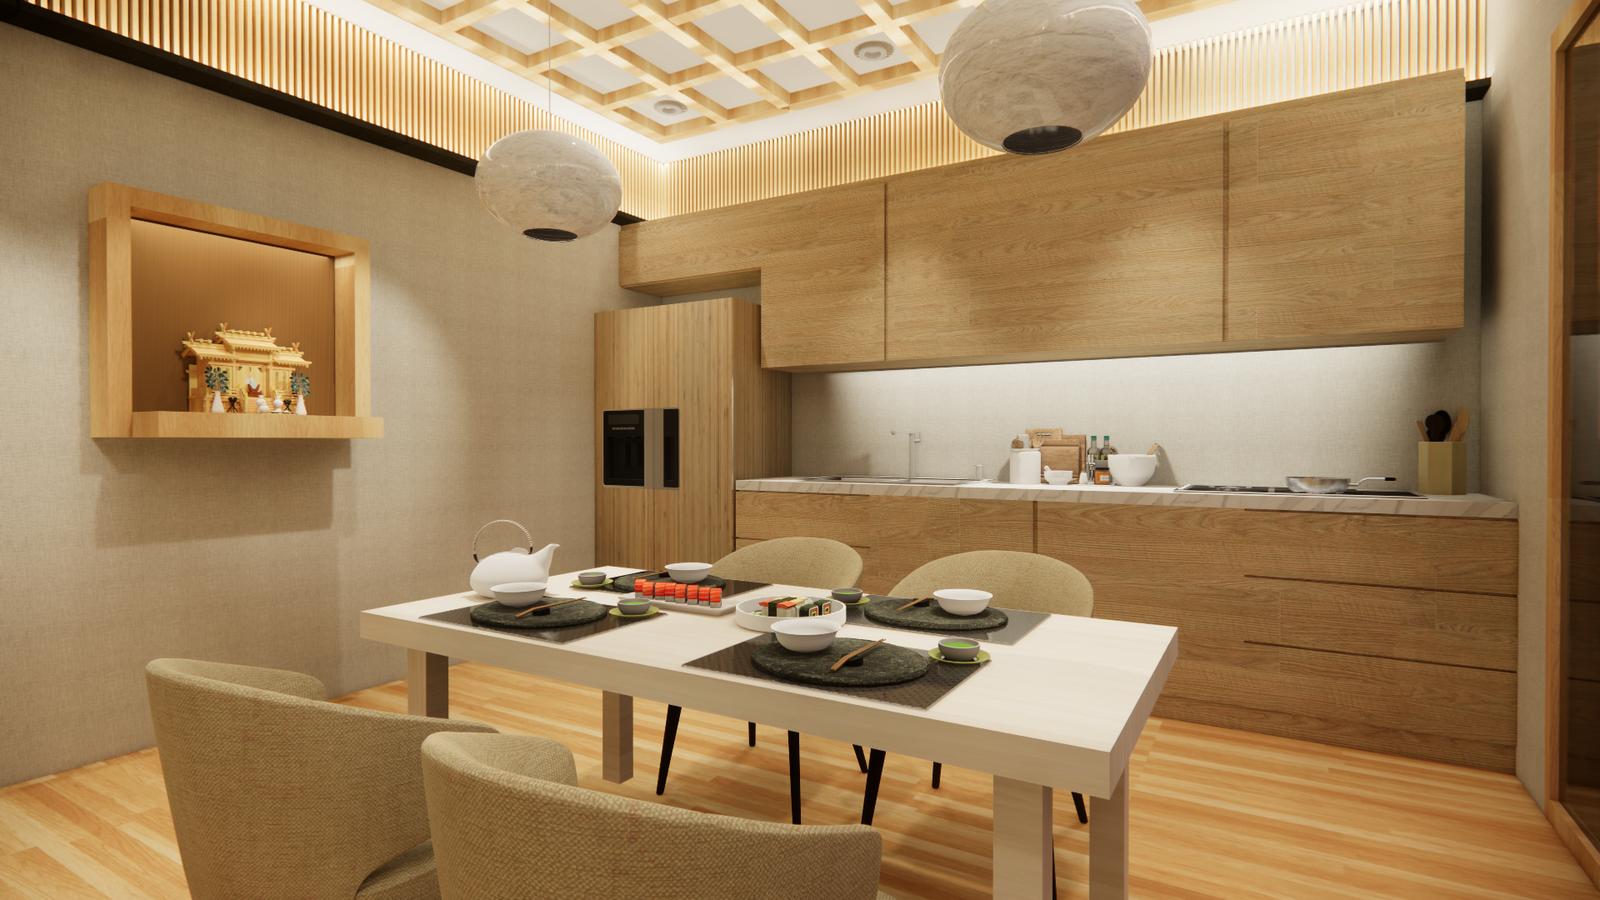 Naniwa Senior Living Center - Apartment Unit's Dining Space